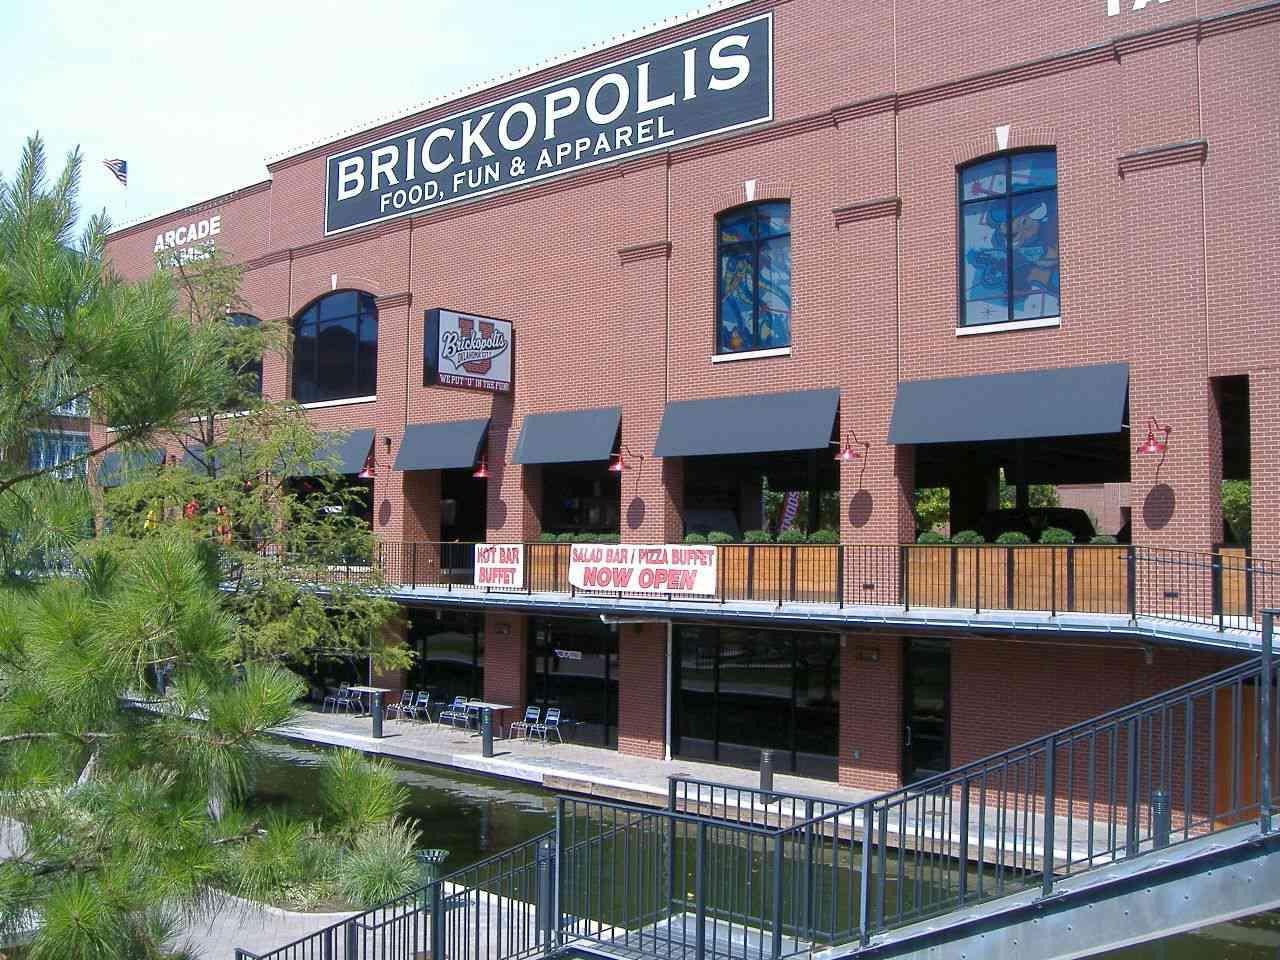 Brickopolis Bricktown